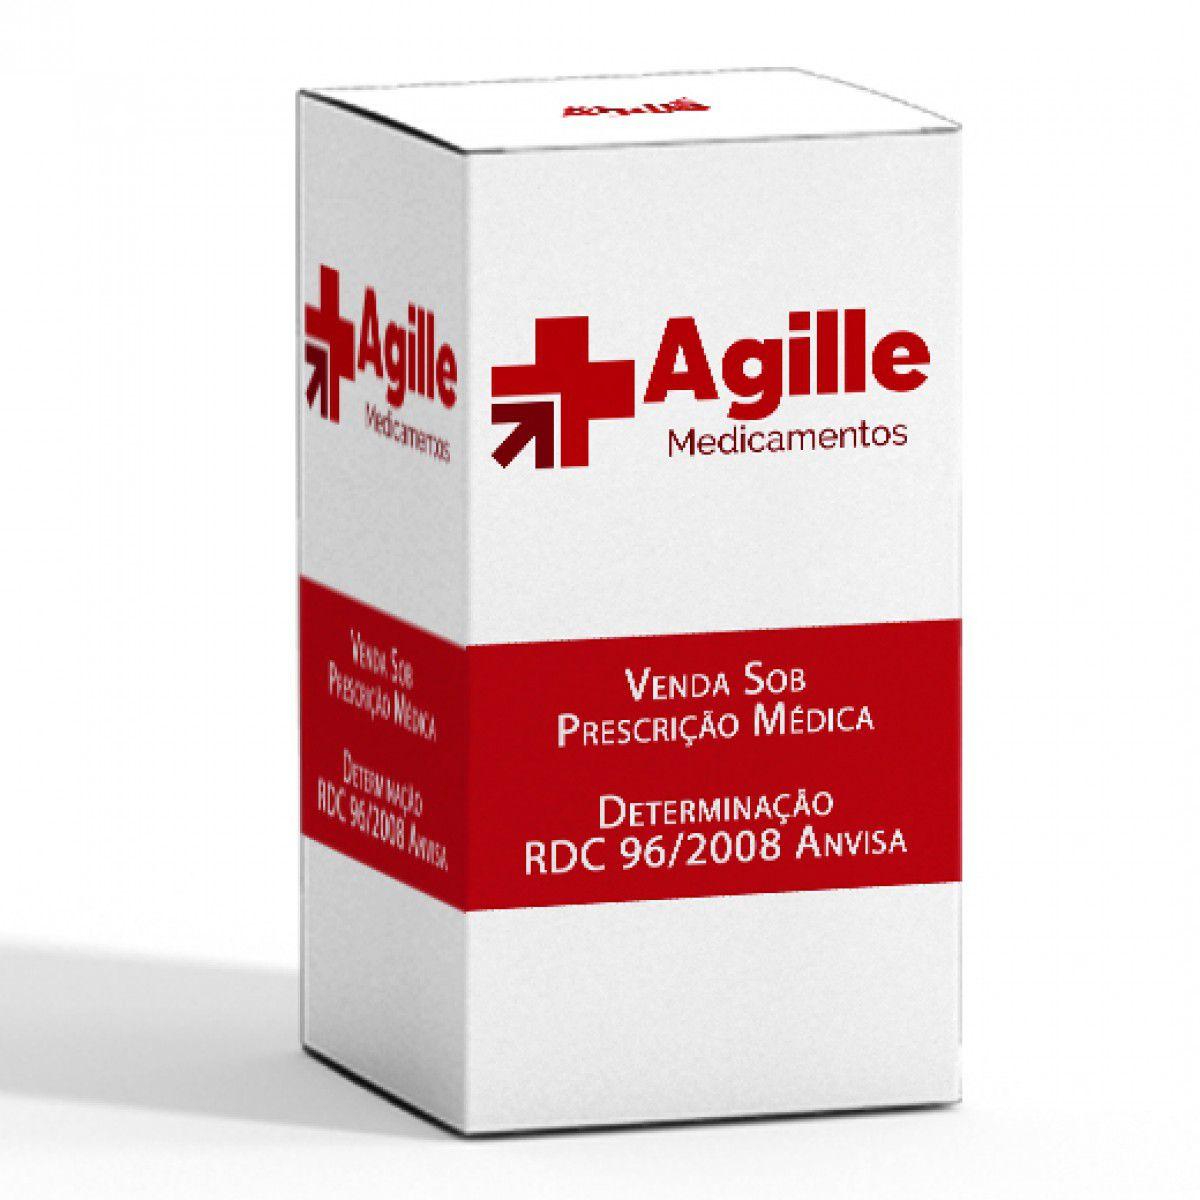 ENOXALOW 60MG 10SER 0,6 ML + SIST. SEGURANCA  - Agille Speciality